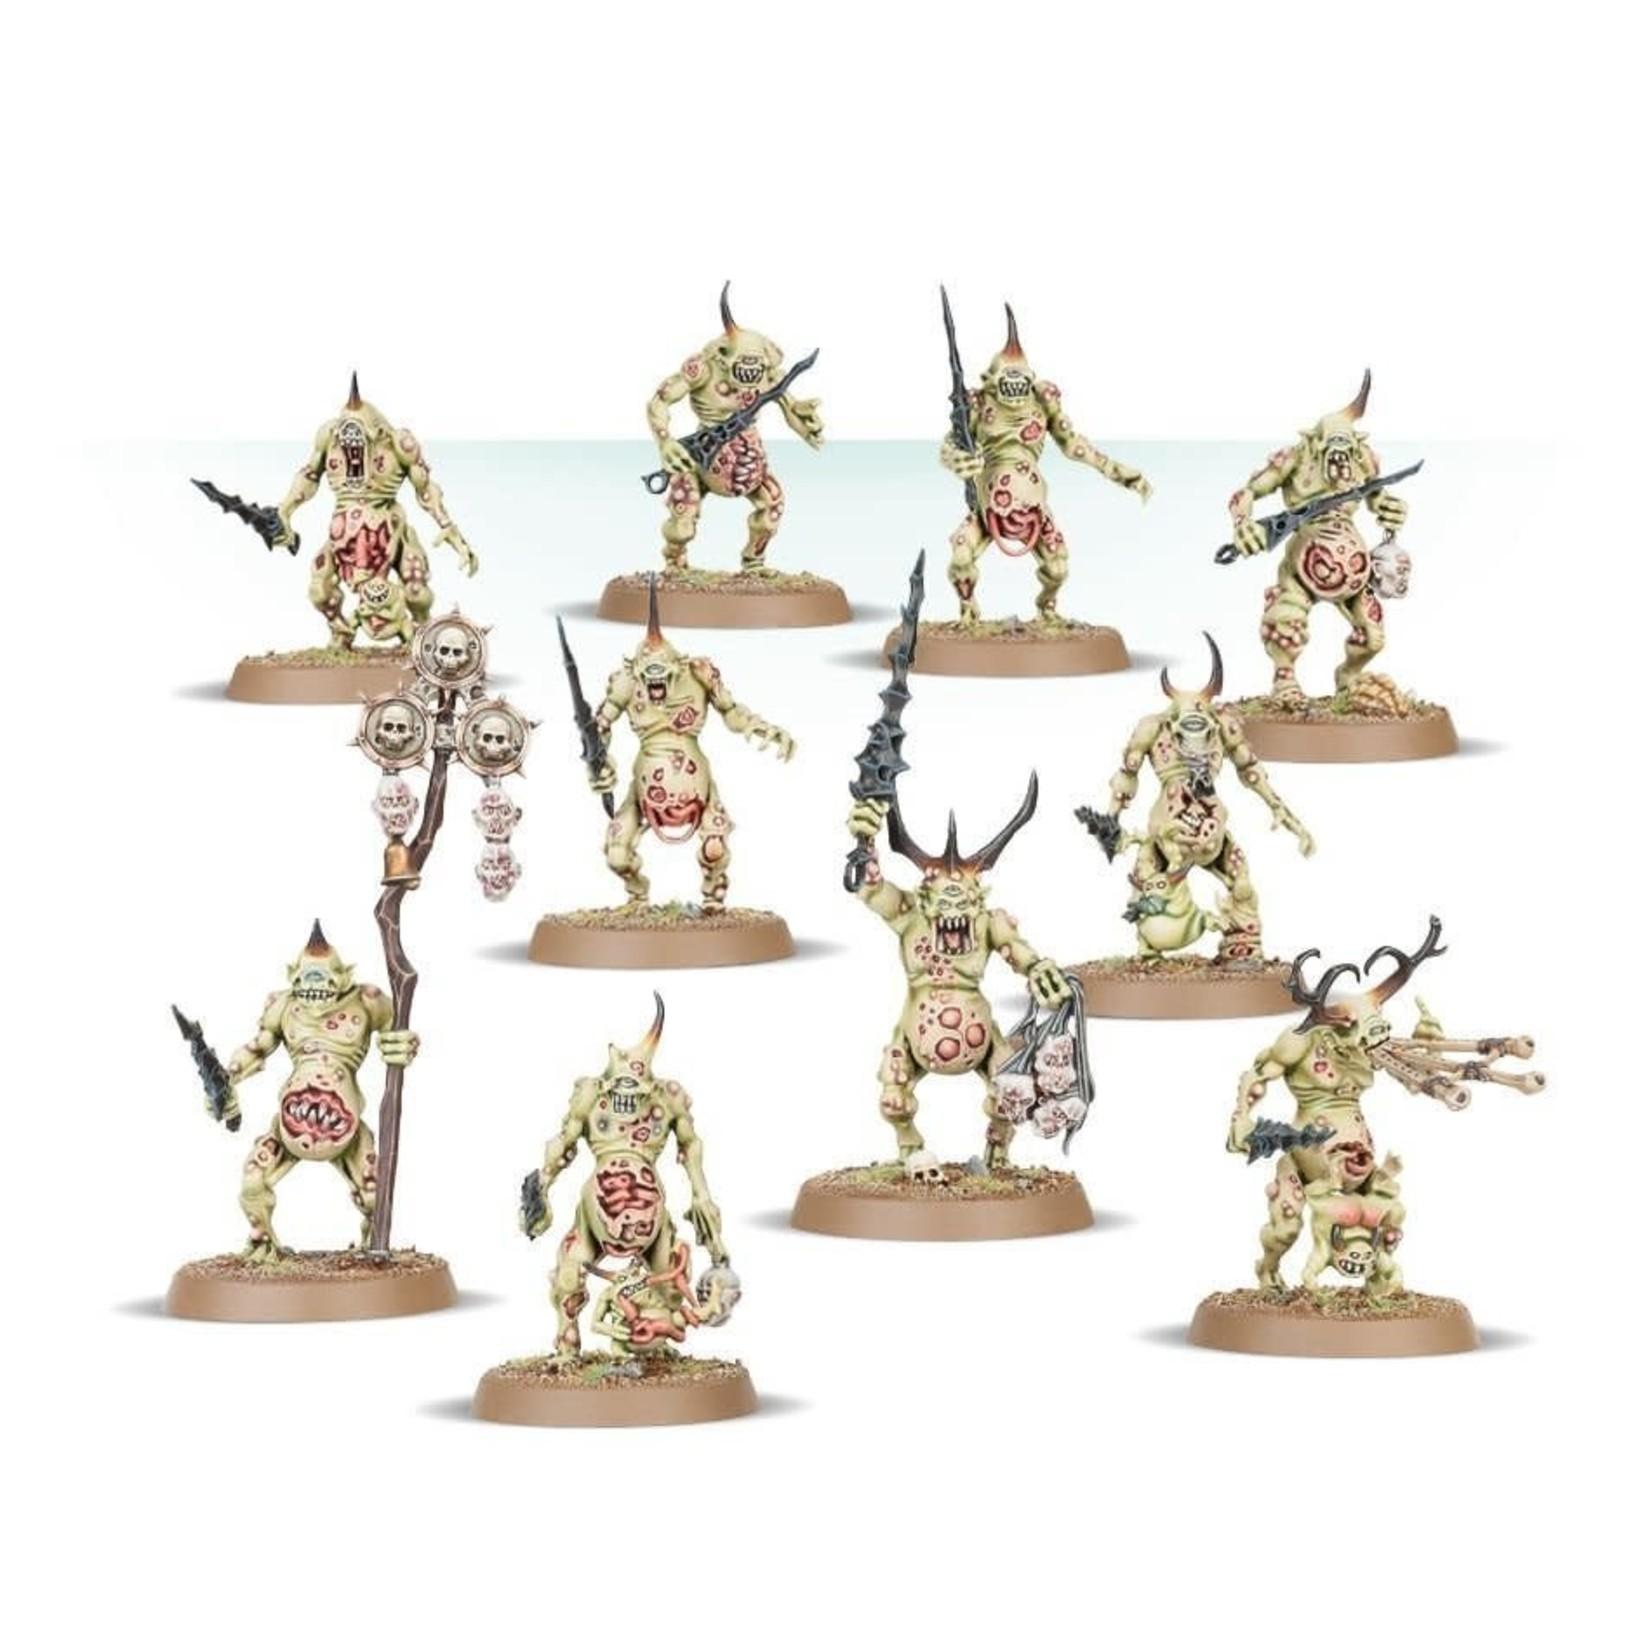 Games Workshop Warhammer Age of Sigmar: Daemons of Nurgle - Plaguebearers